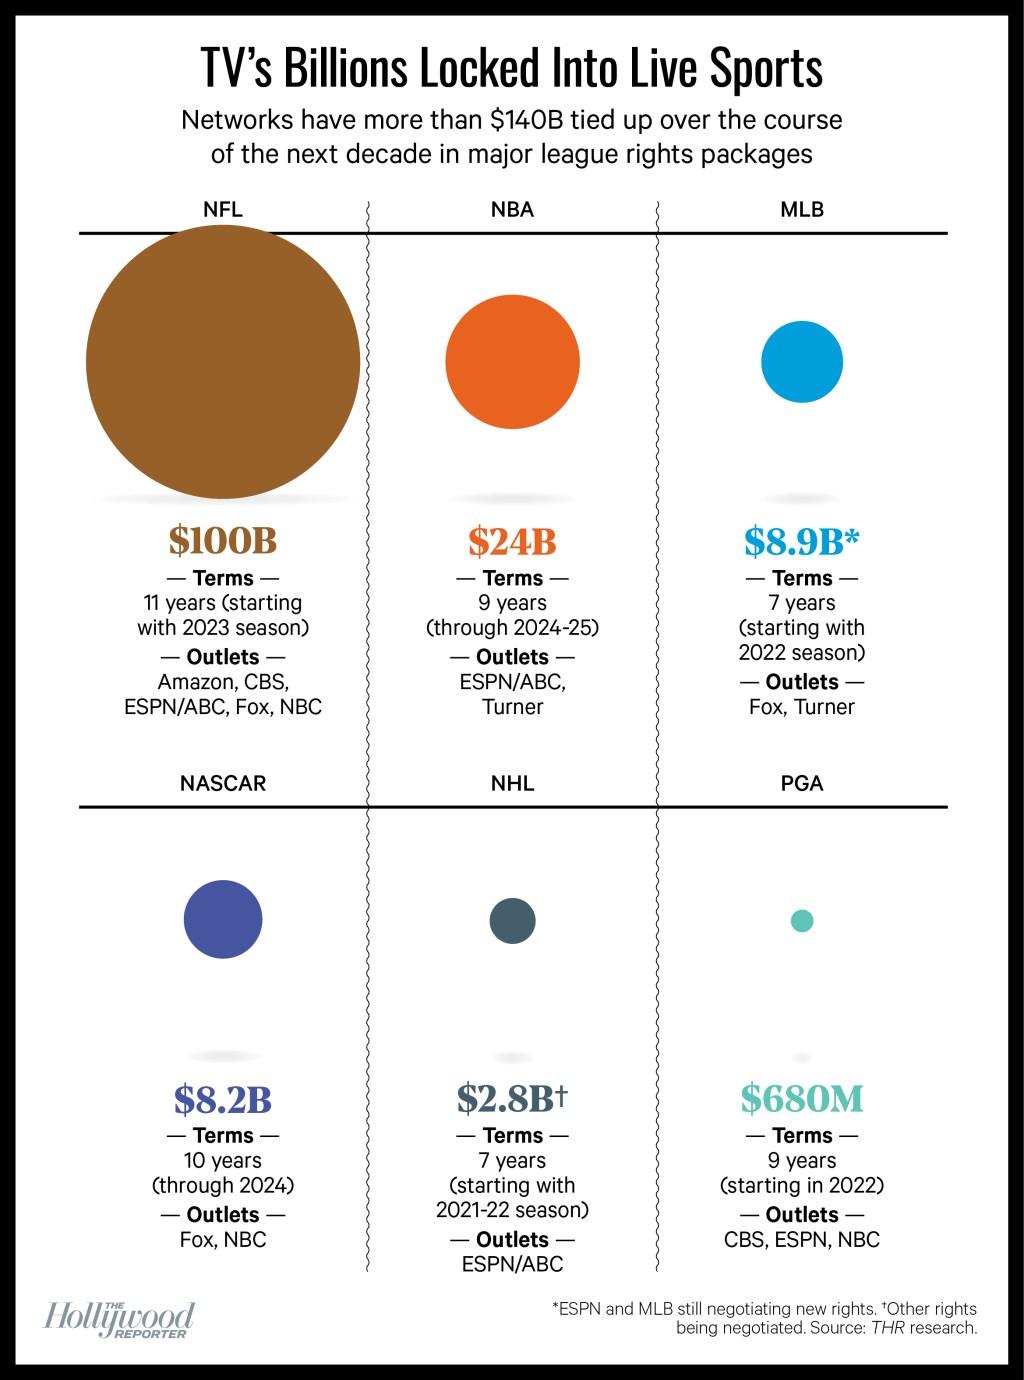 chart: TV's Billions Locked Into Live Sports